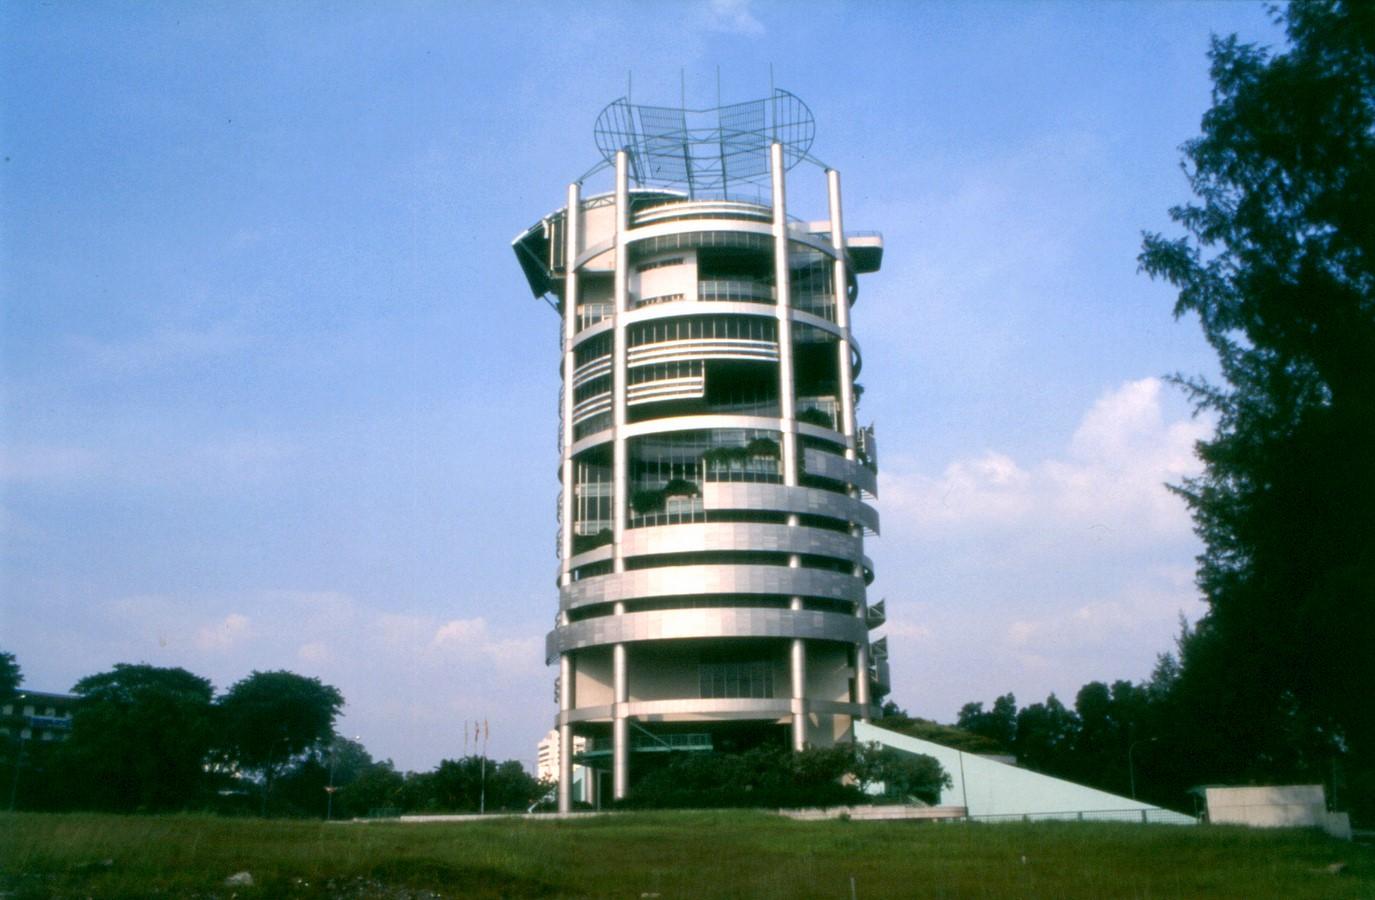 R.Hamzah & Yeang Sdn. Bhd., Malaysia - Sheet3